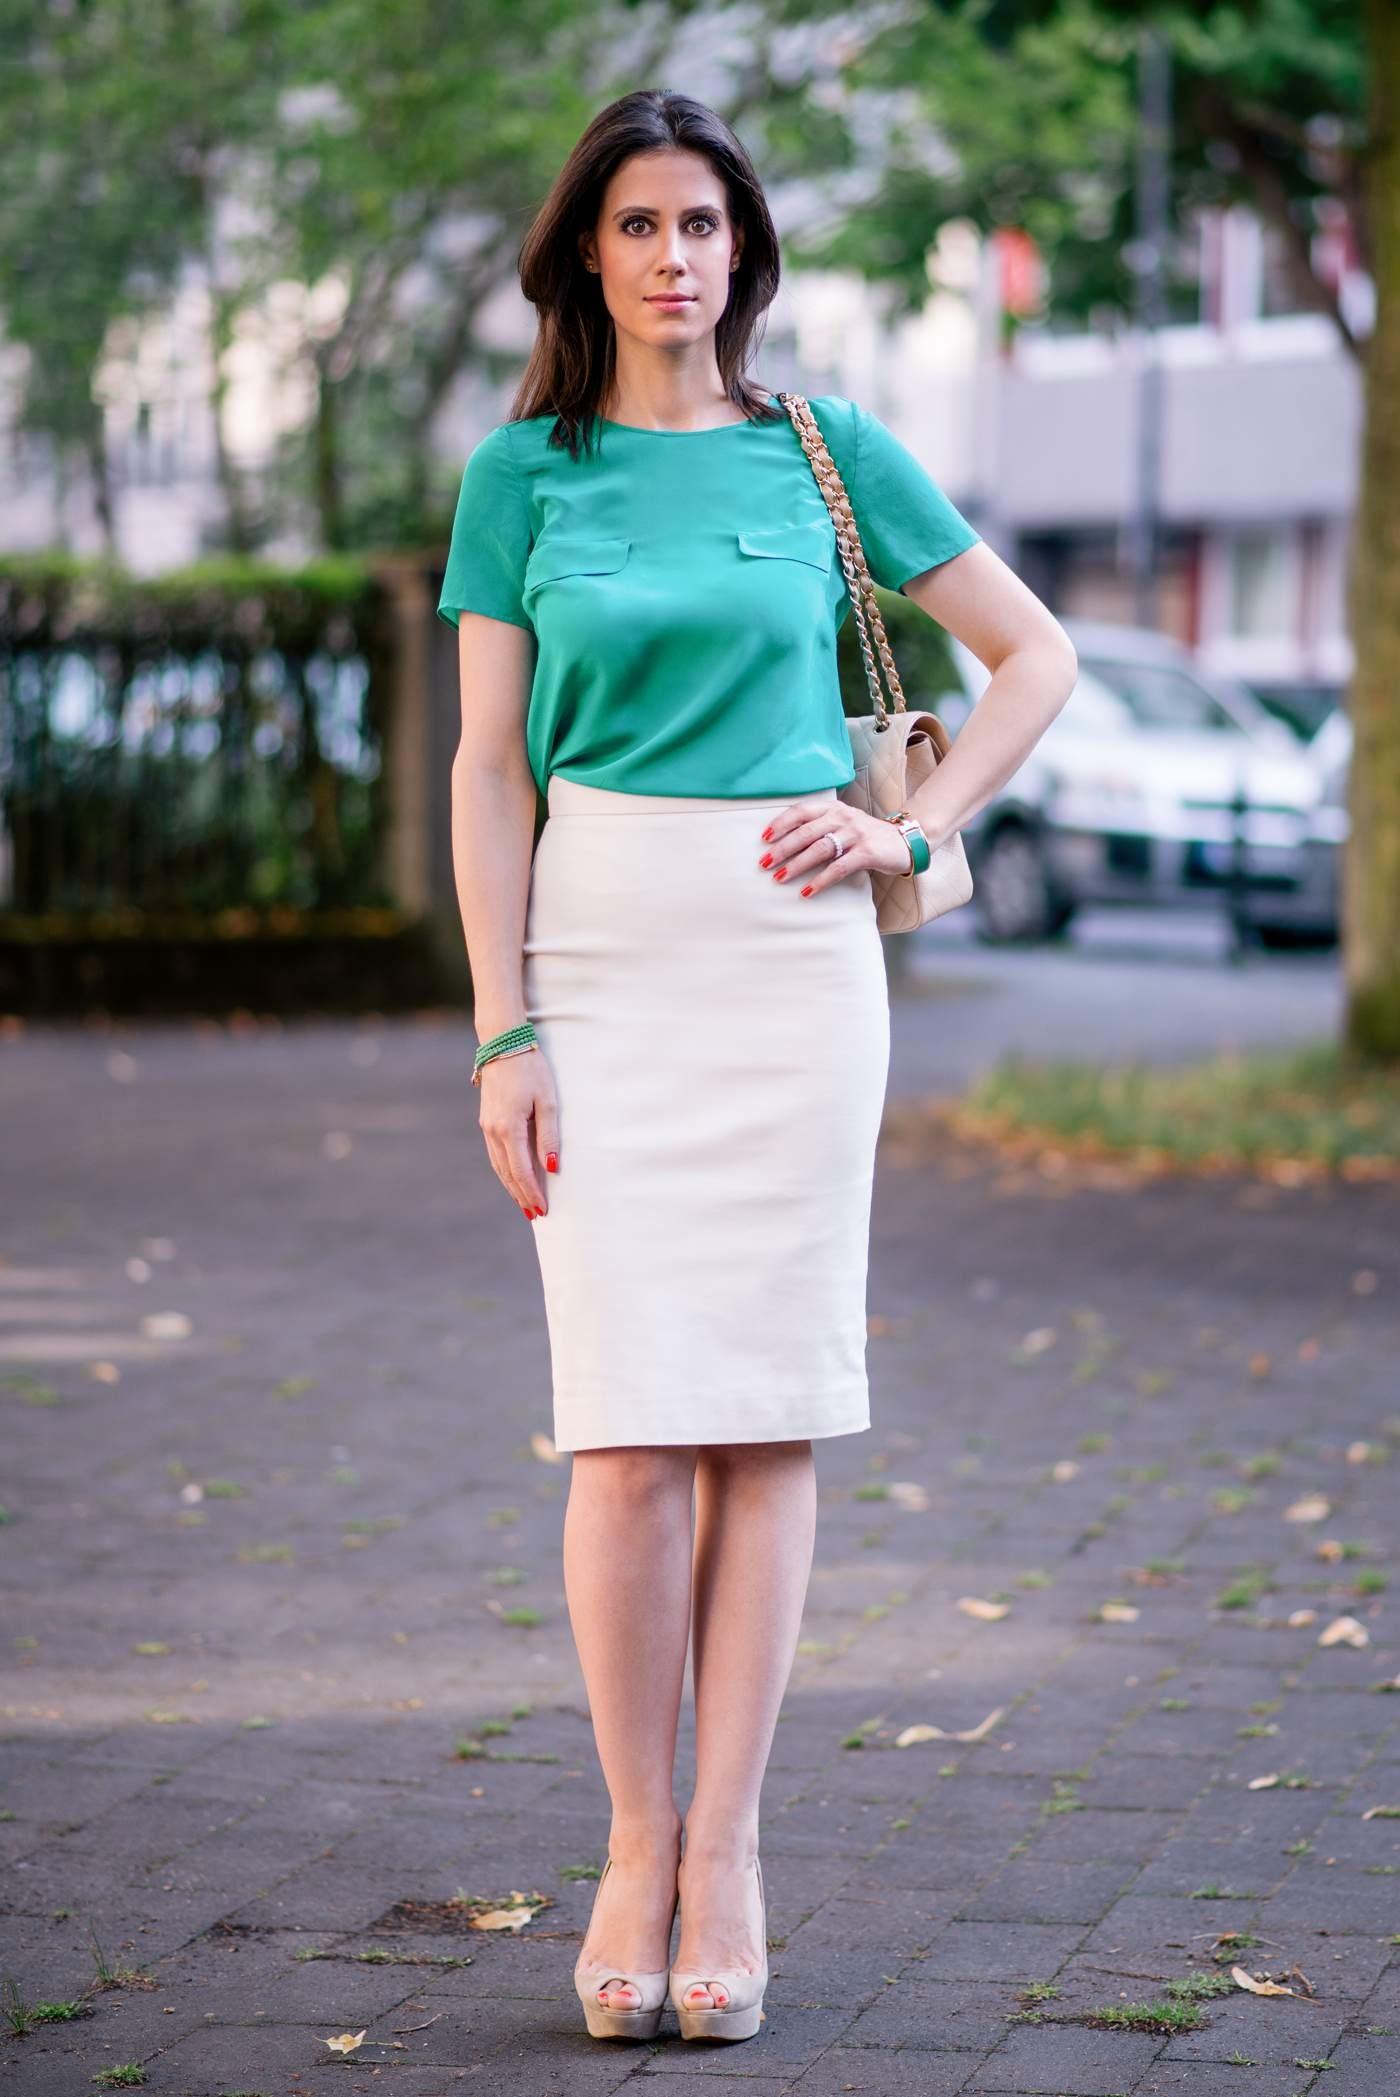 pantone-emerald-green-outfit-DSC_3014